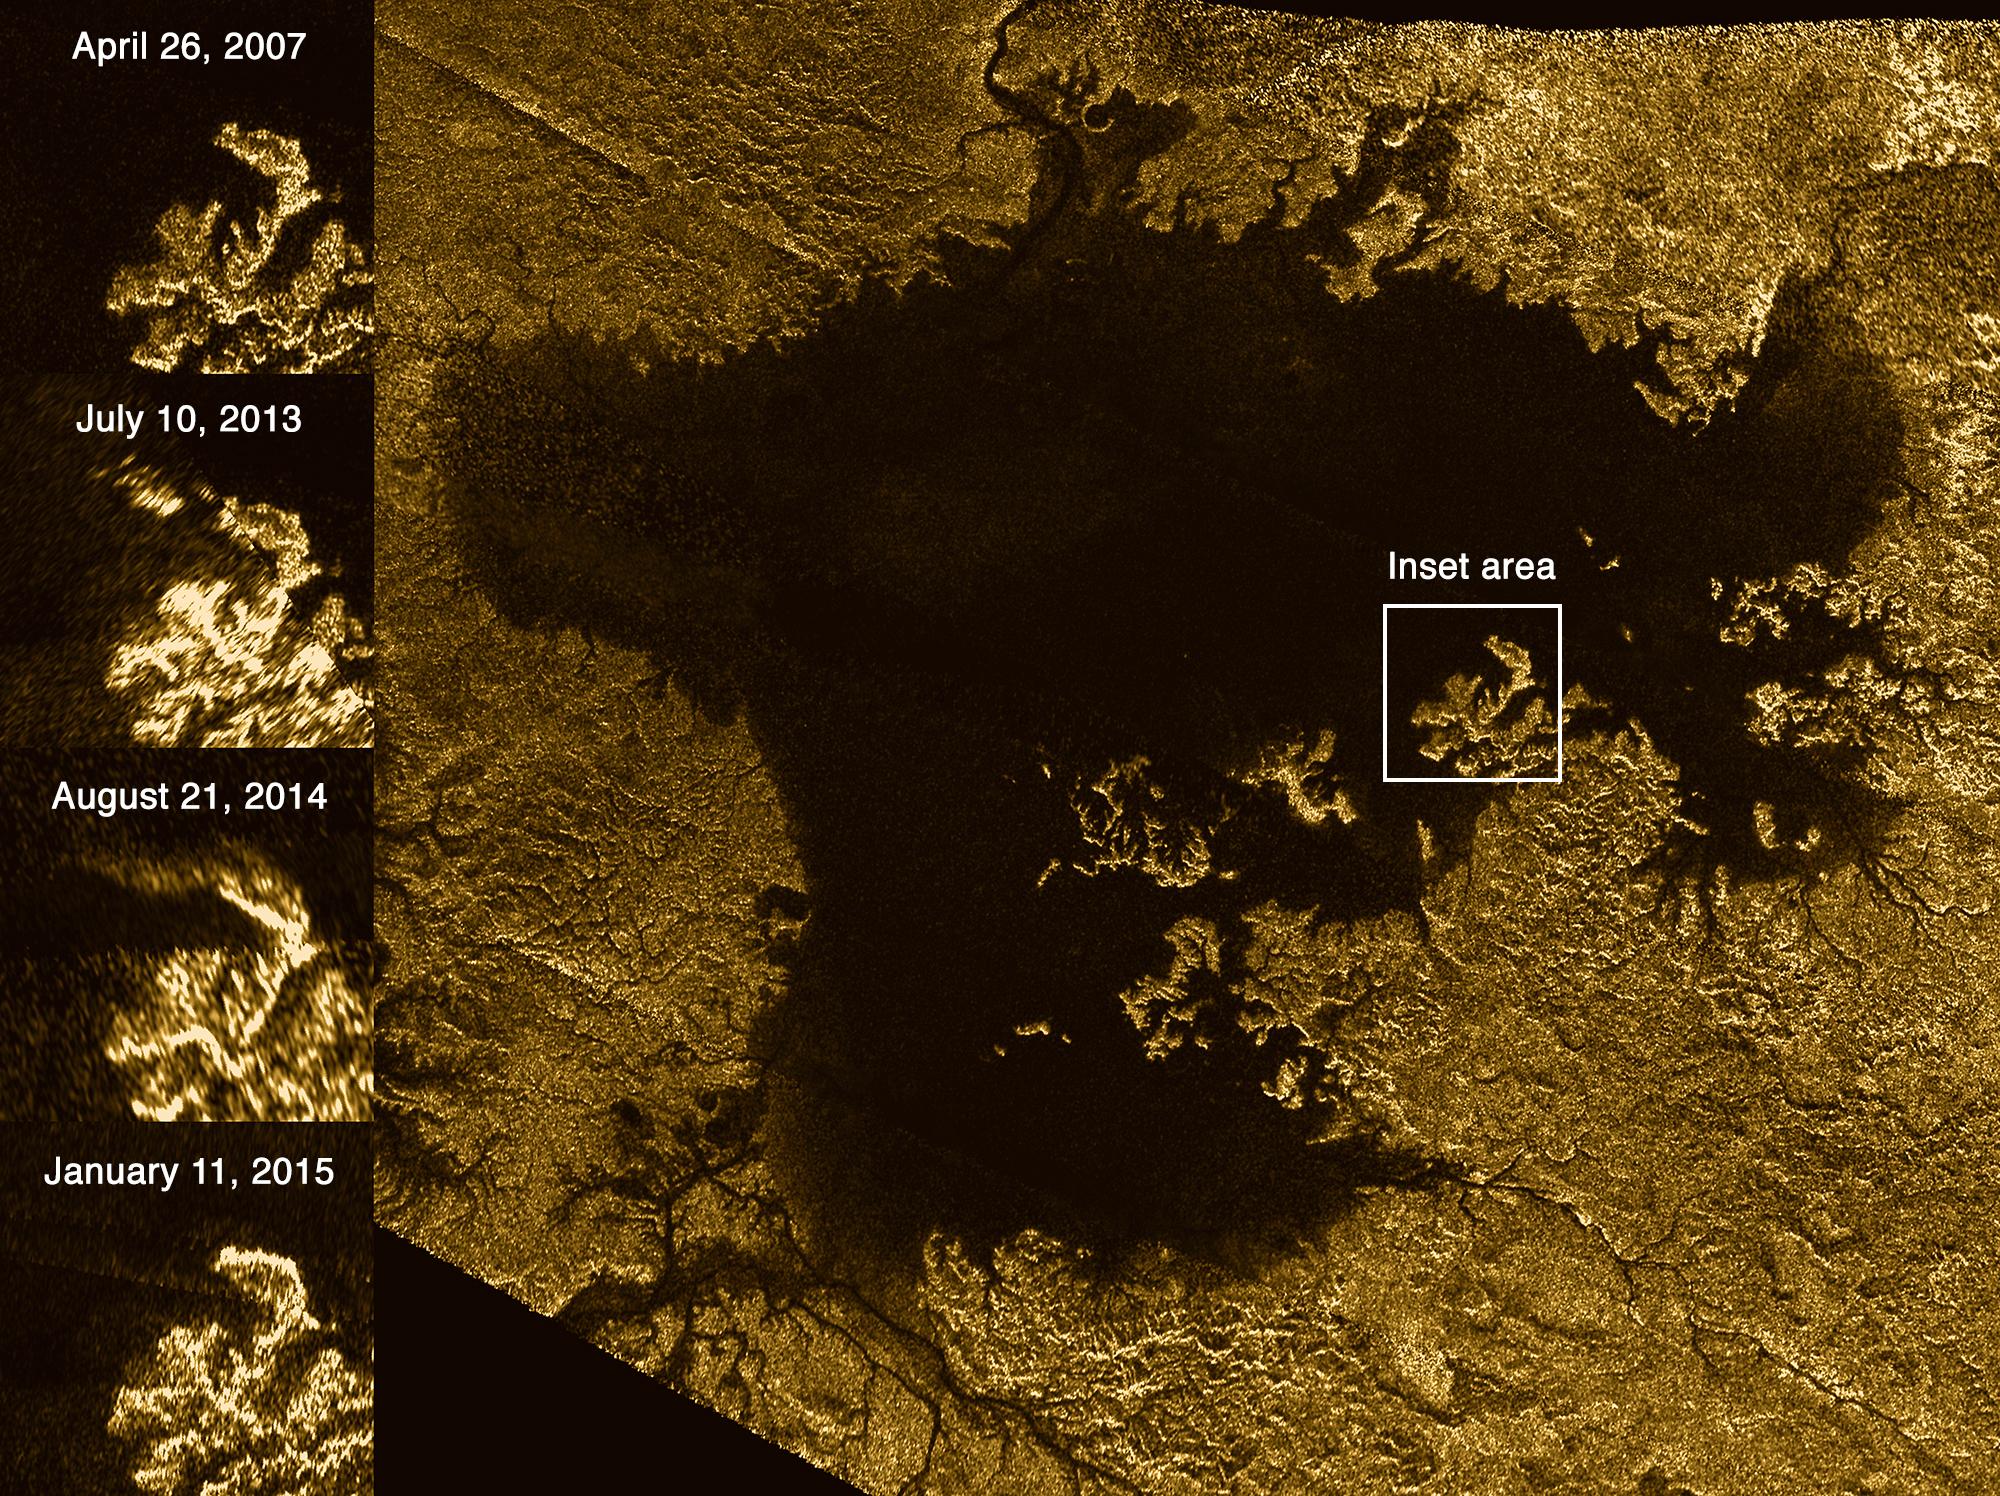 PIA20021-SaturnMoonTitan-MagicIsland-20160302.jpg